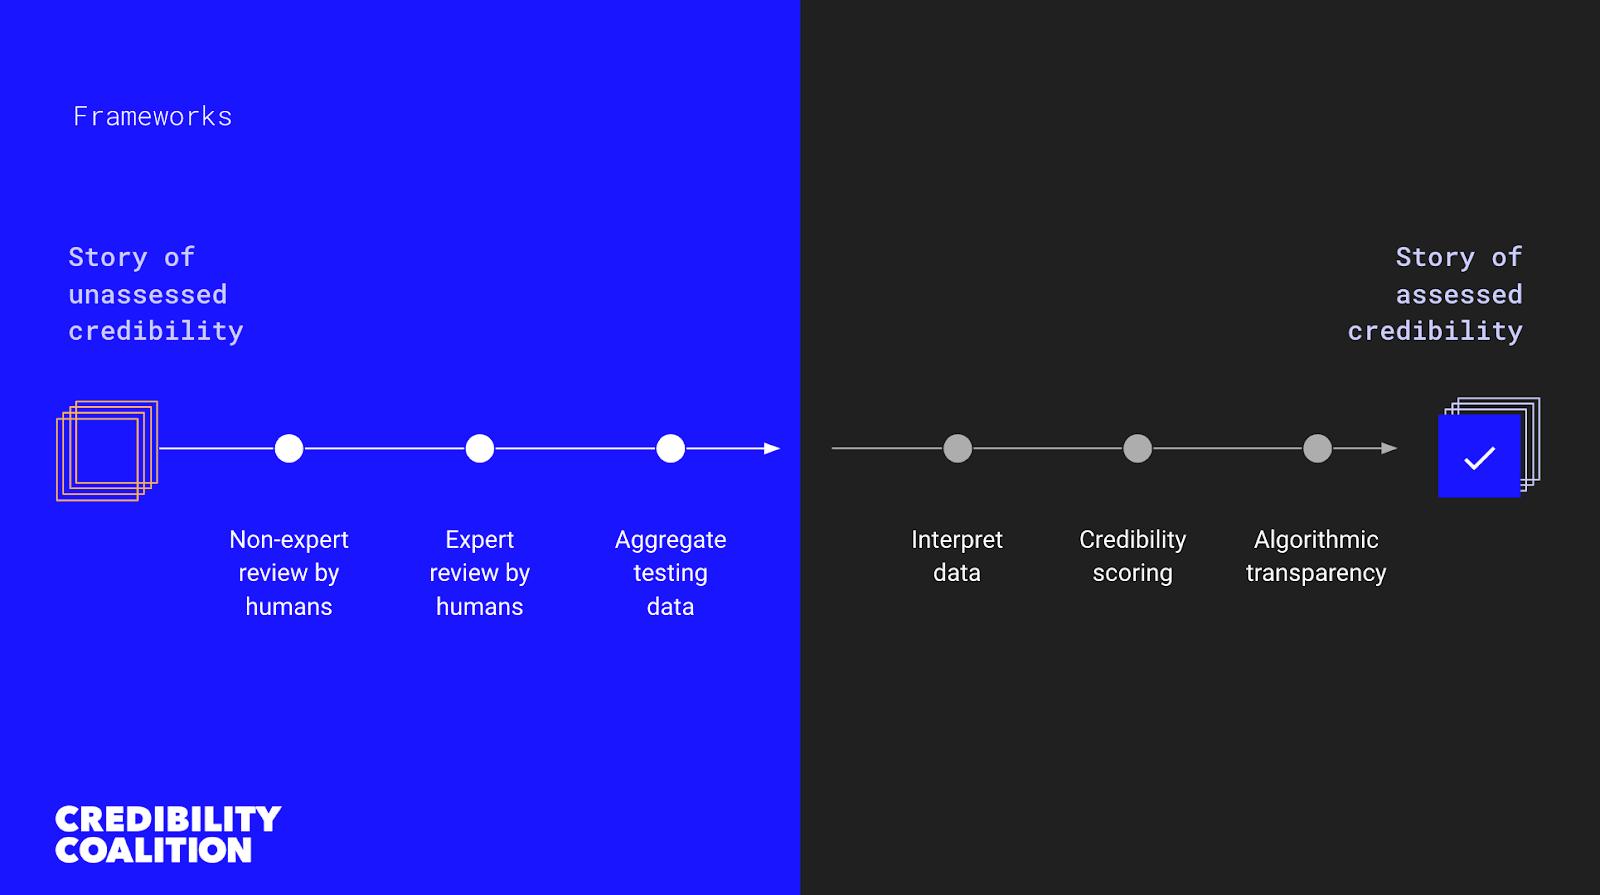 credco-framework-assessing-credibility